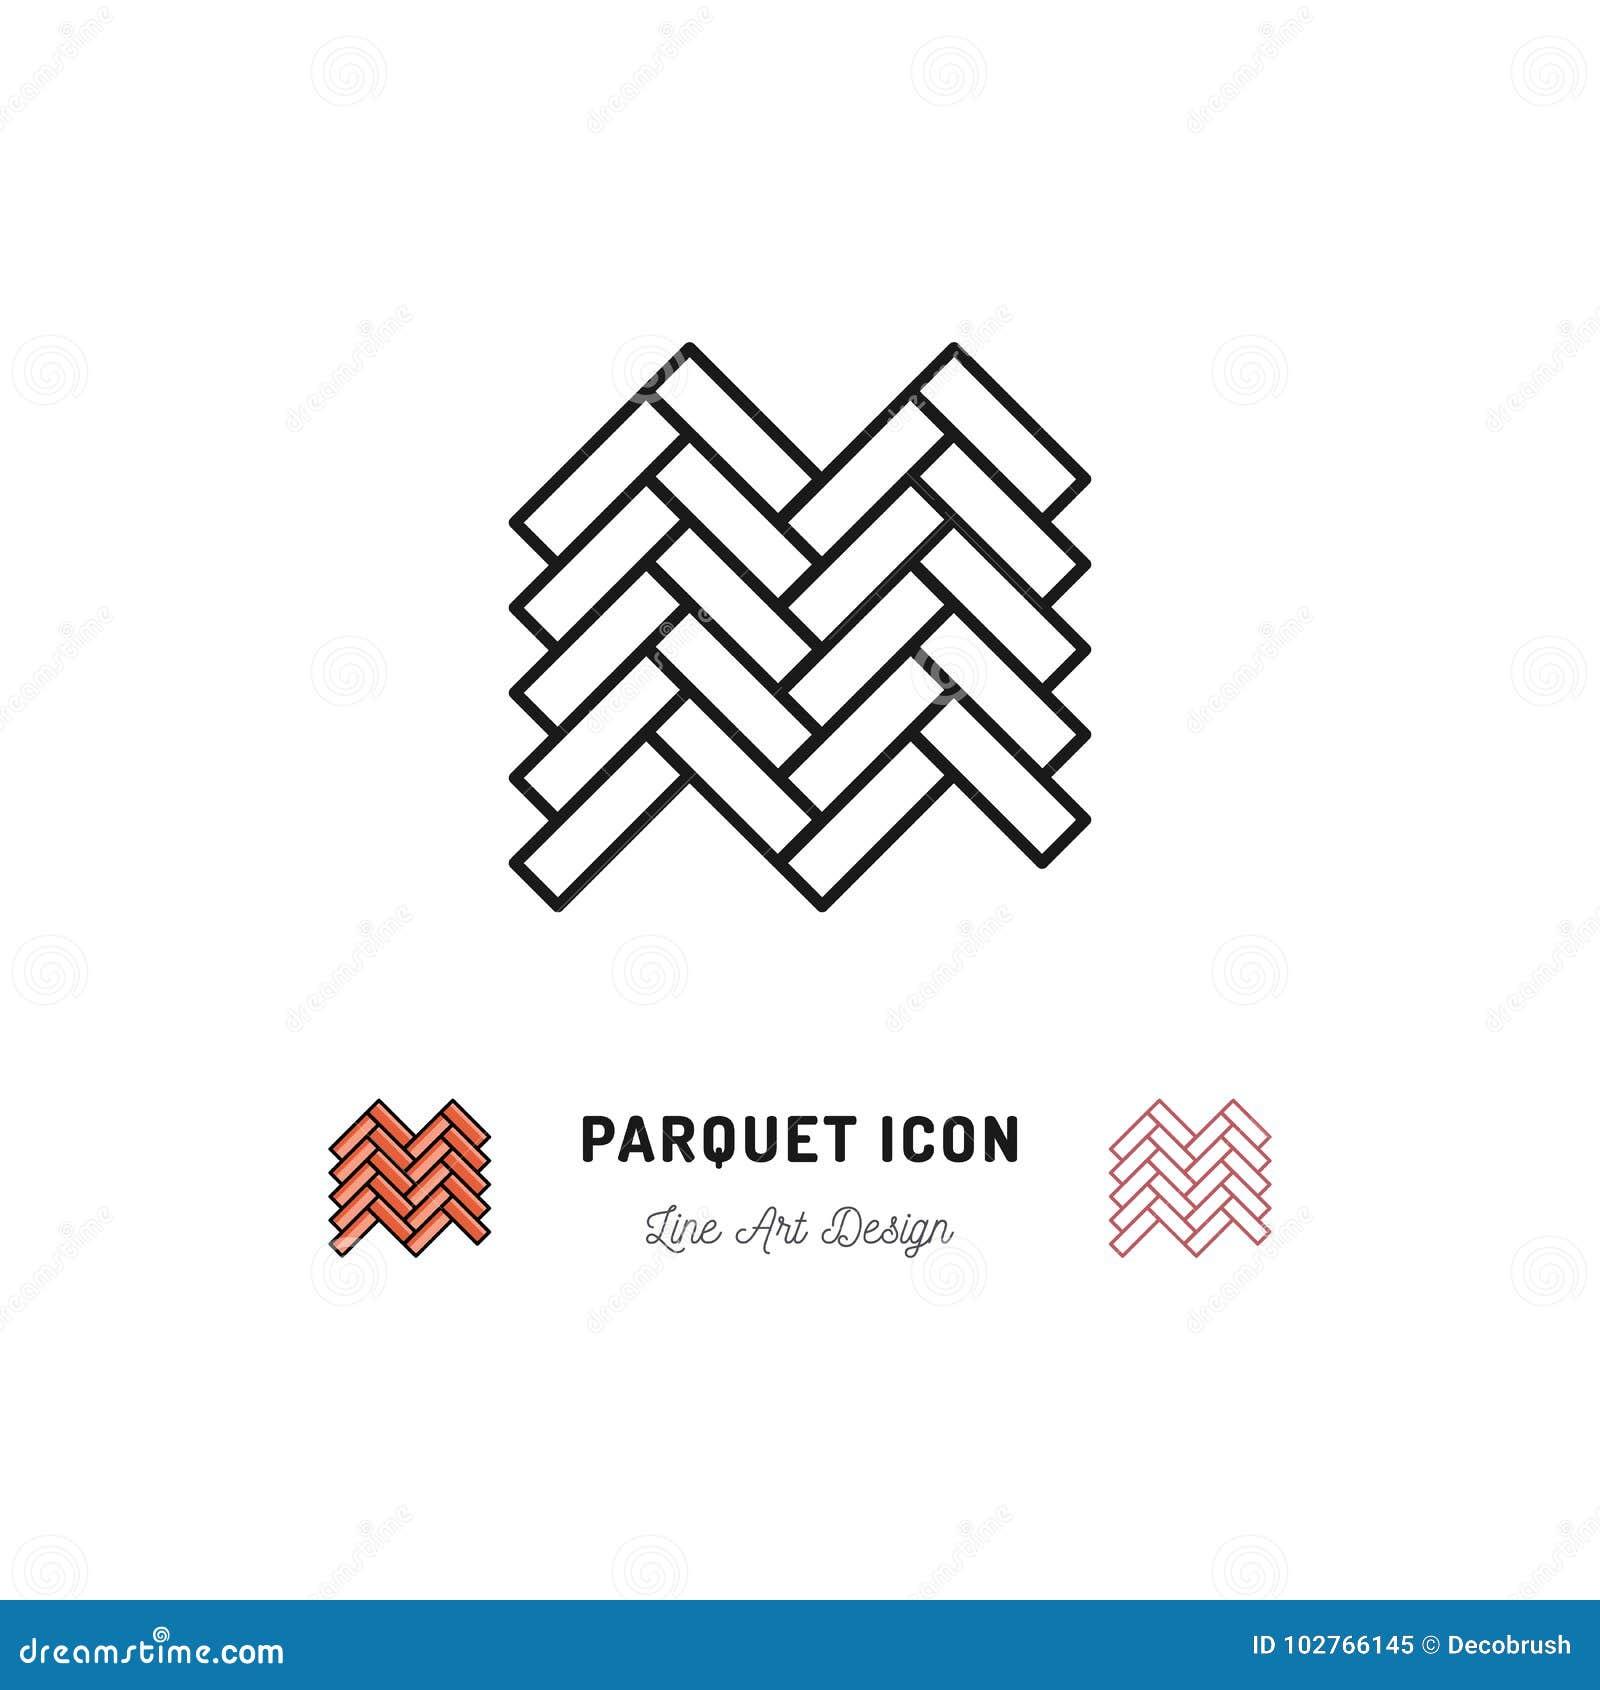 Parkettikone, Bretterbodensymbol, Vector dünne Linie Kunstsymbol